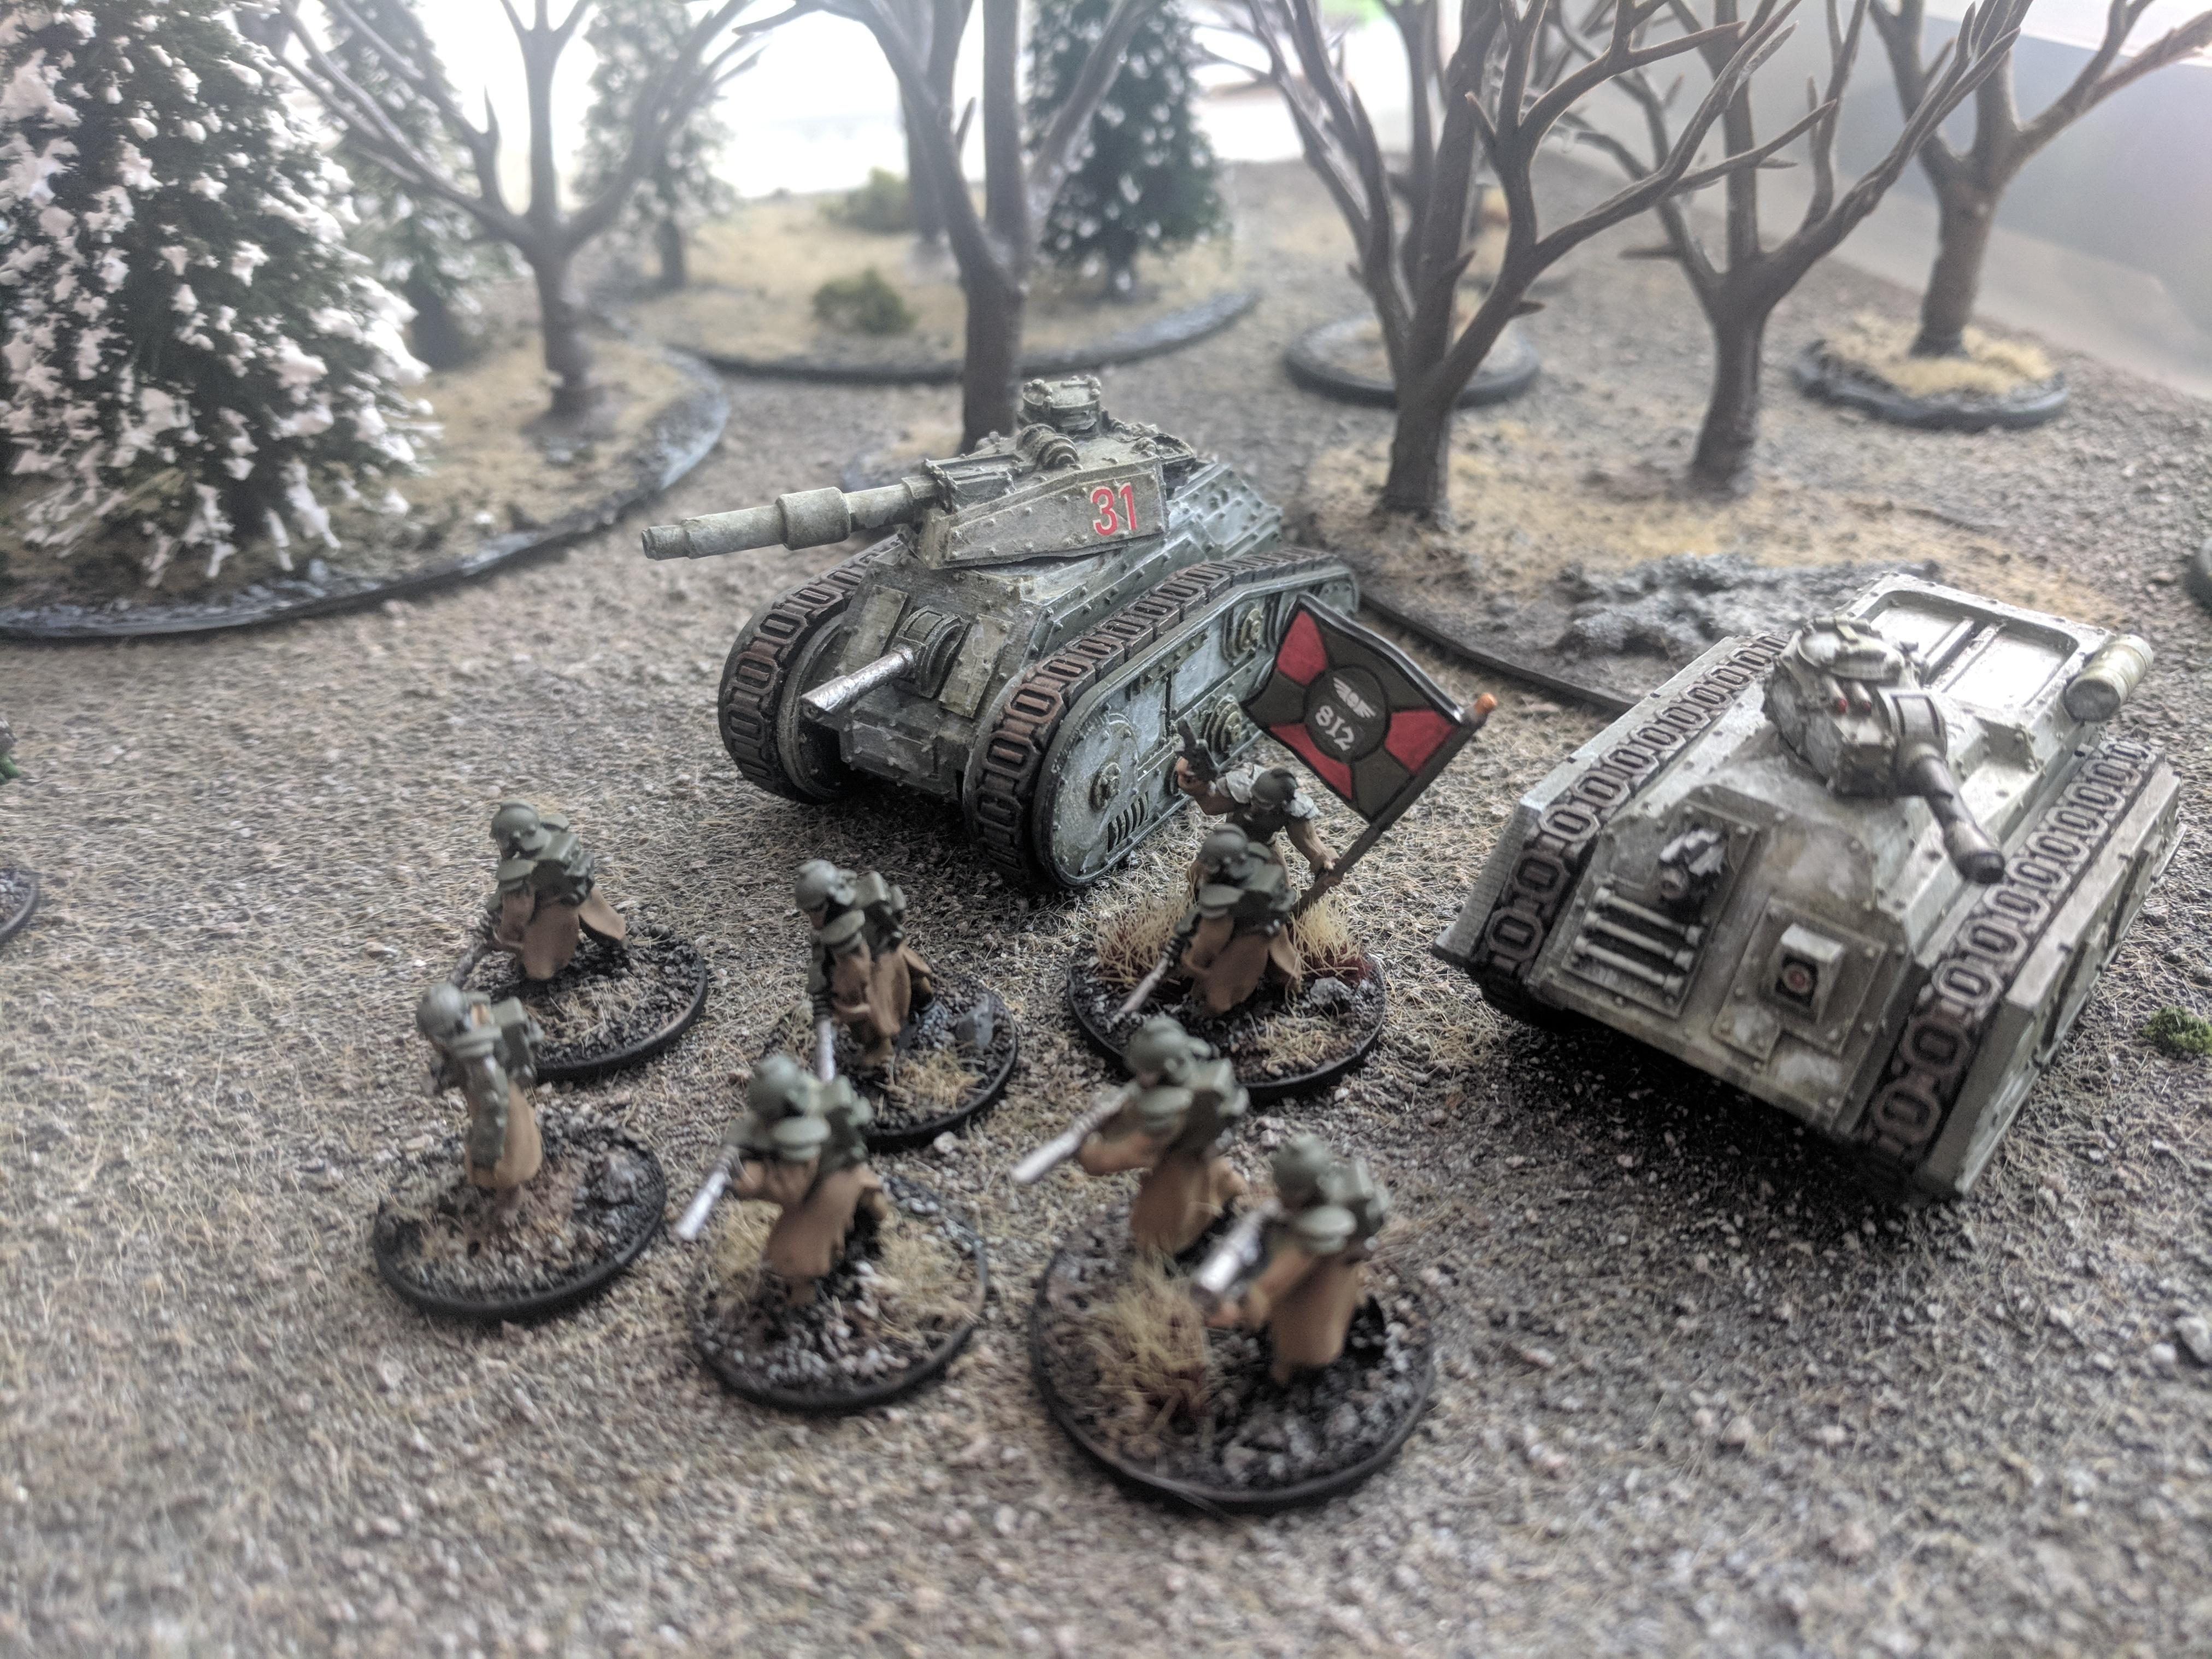 15mm, Imperial Guard, Vanguard Miniatiures, Warhammer 40,000